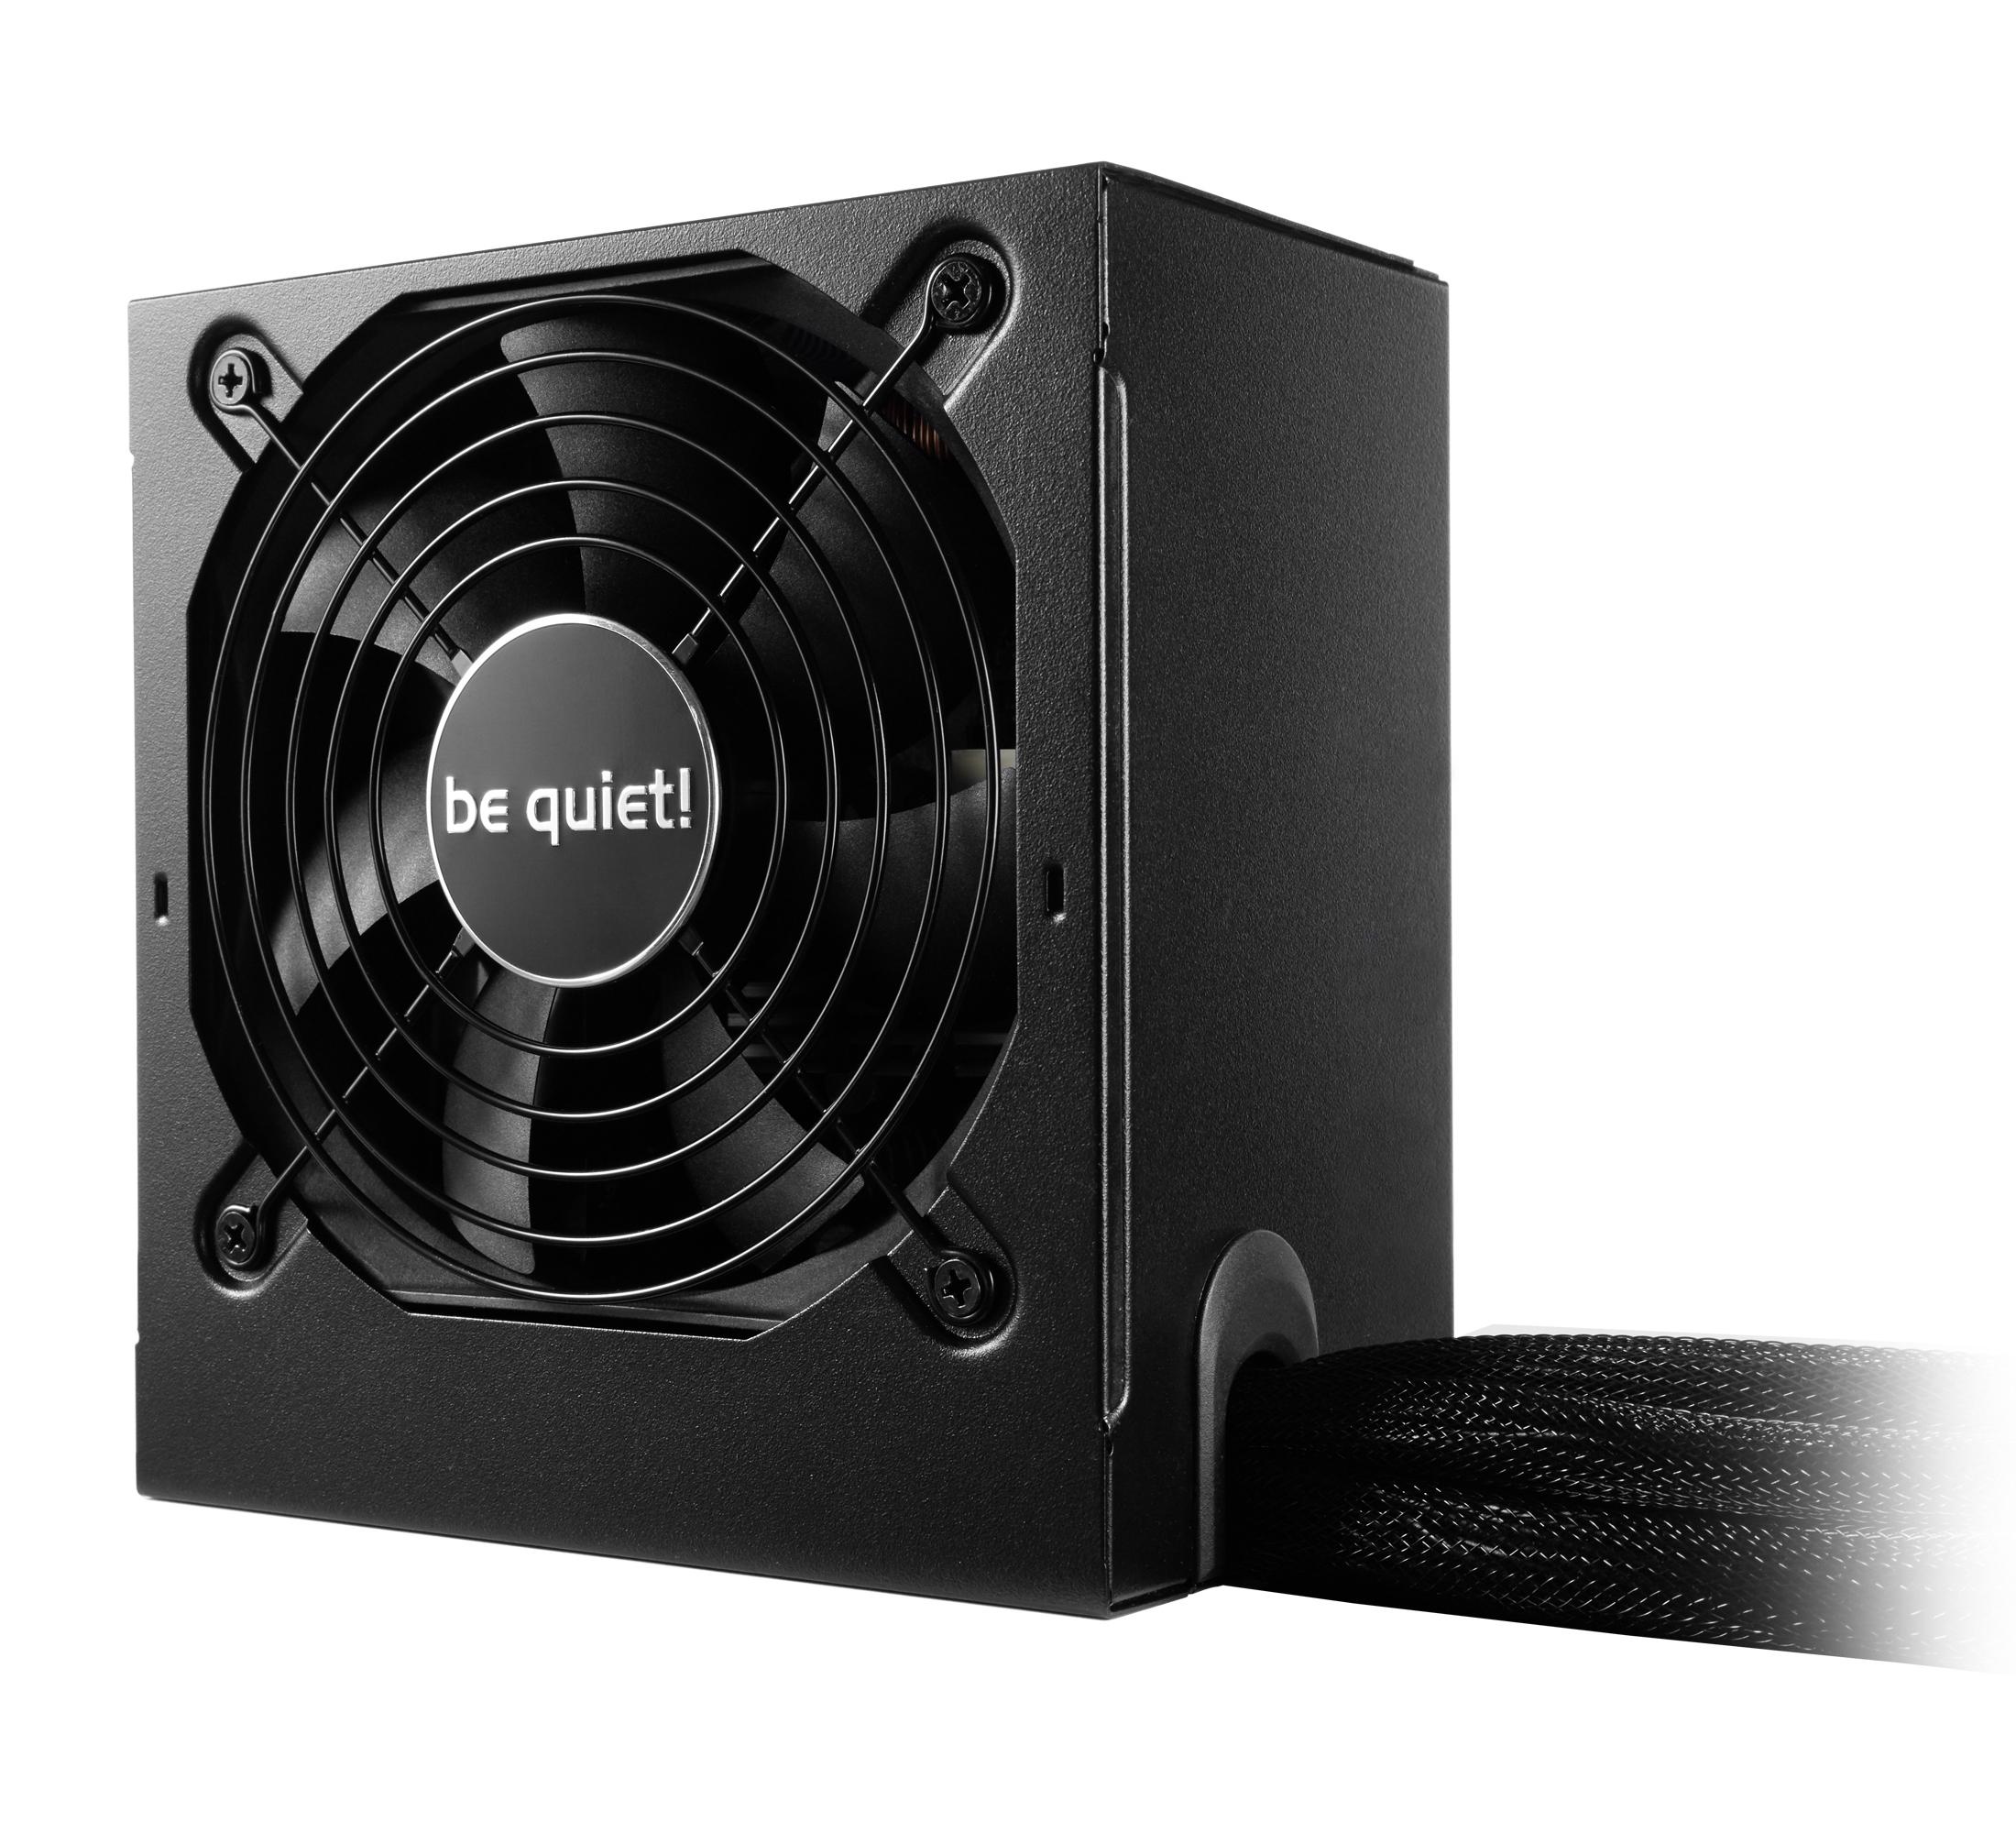 be quiet! System Power 9 500W, 80+ Bronze, ErP, Energy Star 6.1 APFC, Sleeved, 2xPCI-Ex, 6xSATA, 2xPATA, DC-DC // S9-500W